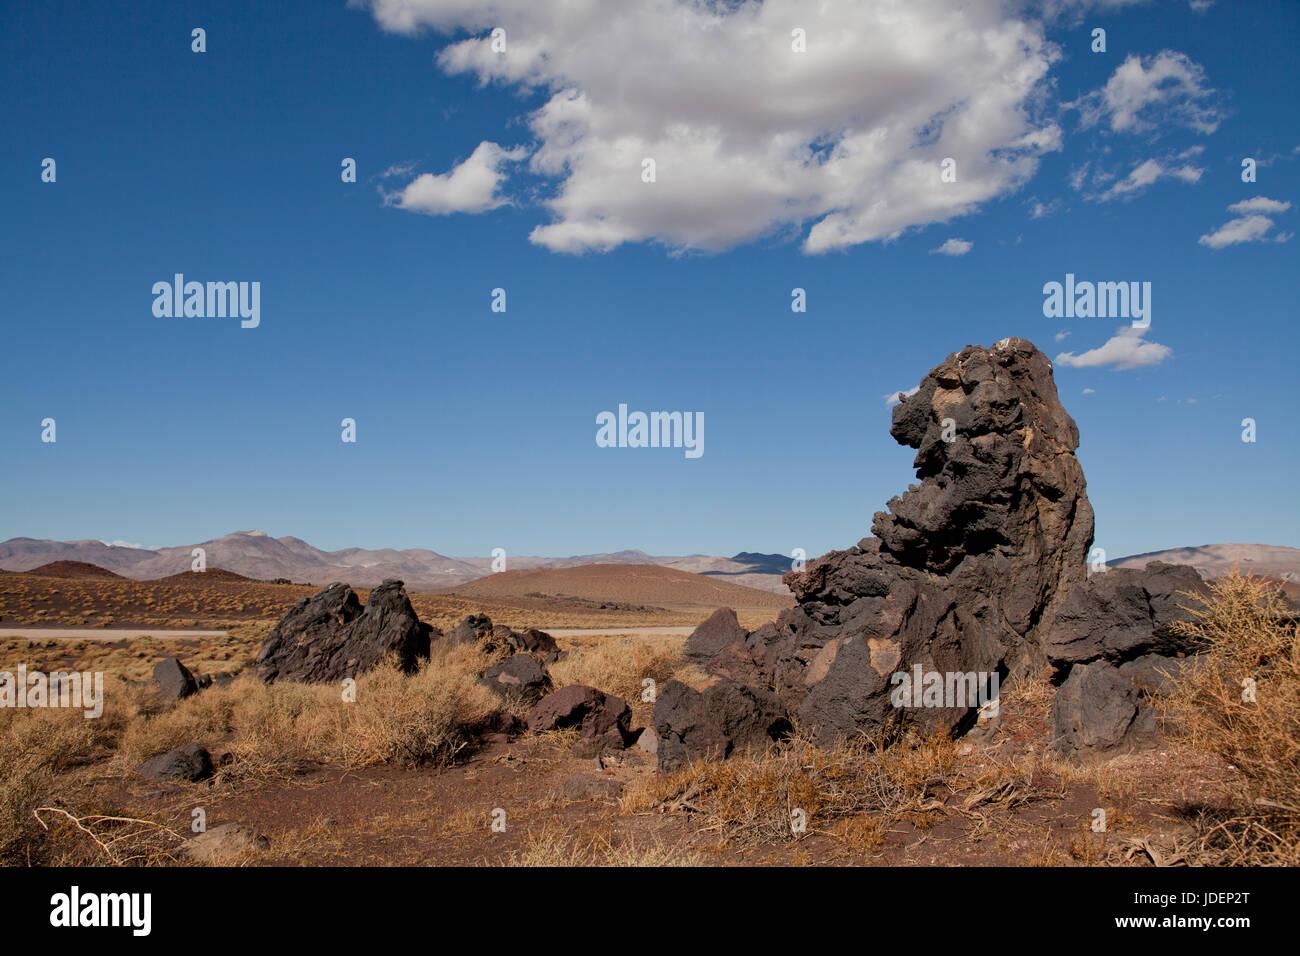 Lava rock formation in Sonoran desert (Sonoran desert landscape)- Arizona USA - Stock Image